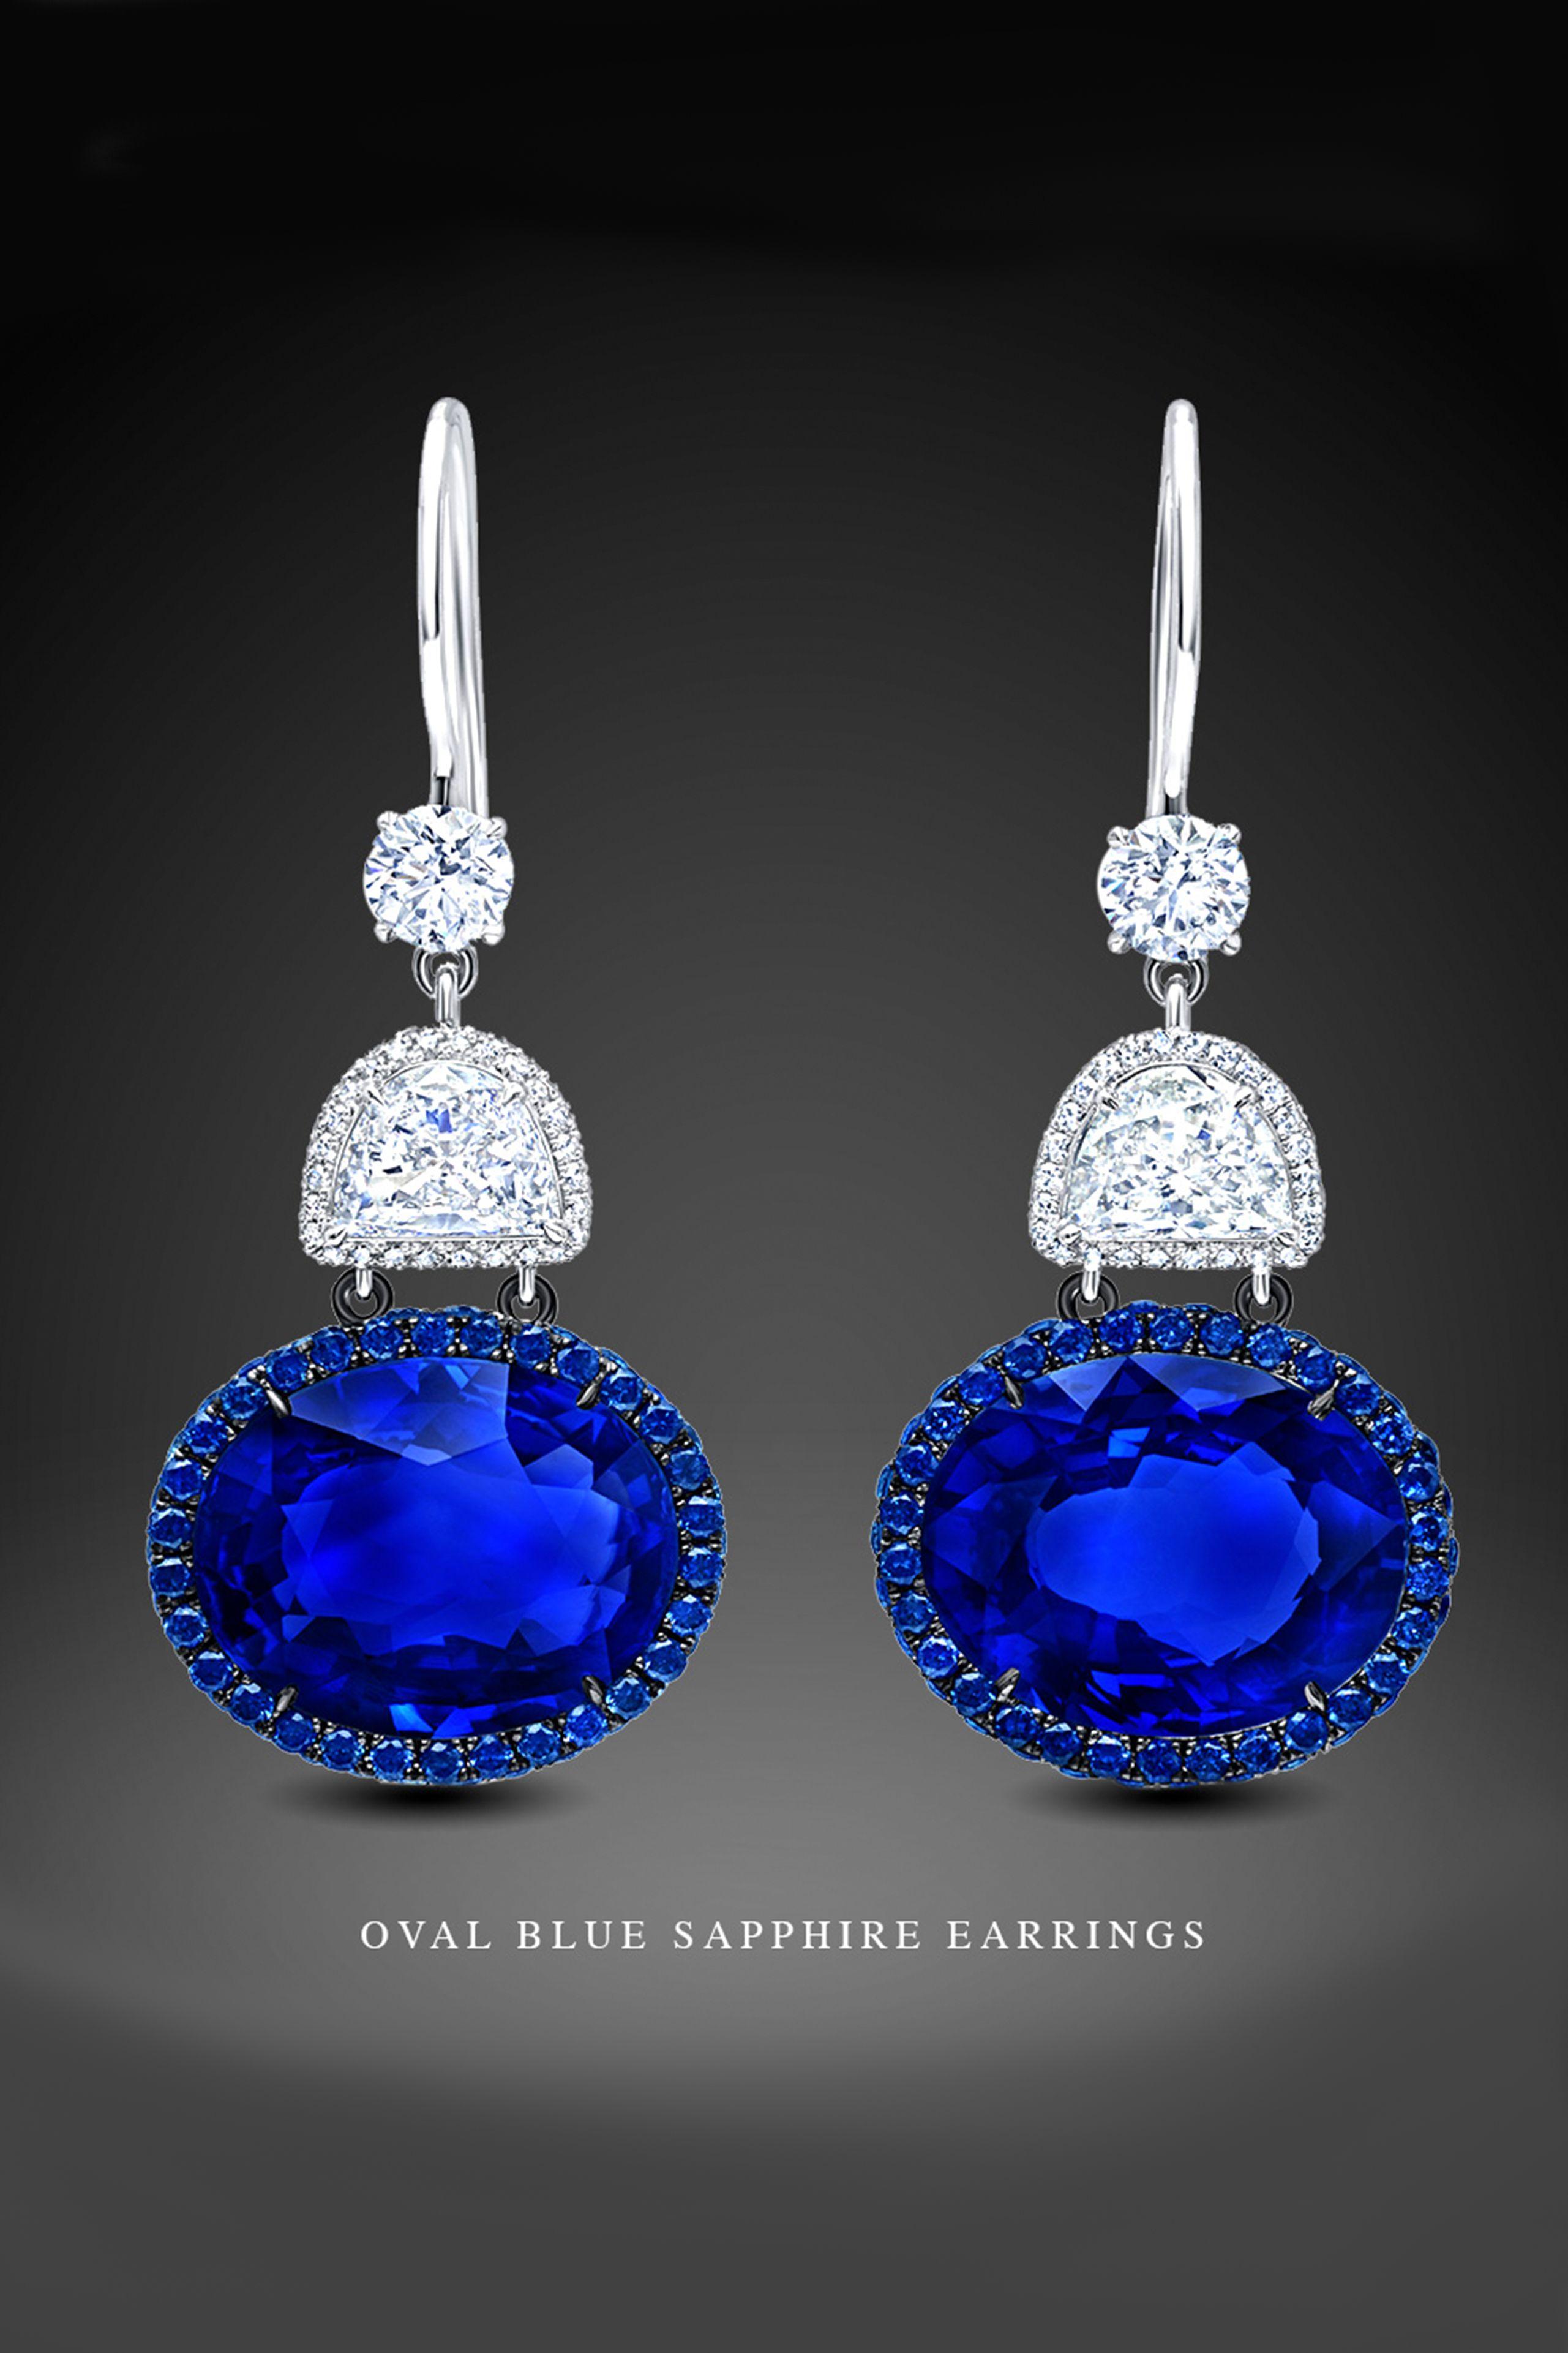 Martin Katz Blue Sapphire And Diamond Earrings Martinkatzjewels Blue Stones Jewelry Blue Sapphire Jewelry Jewelry